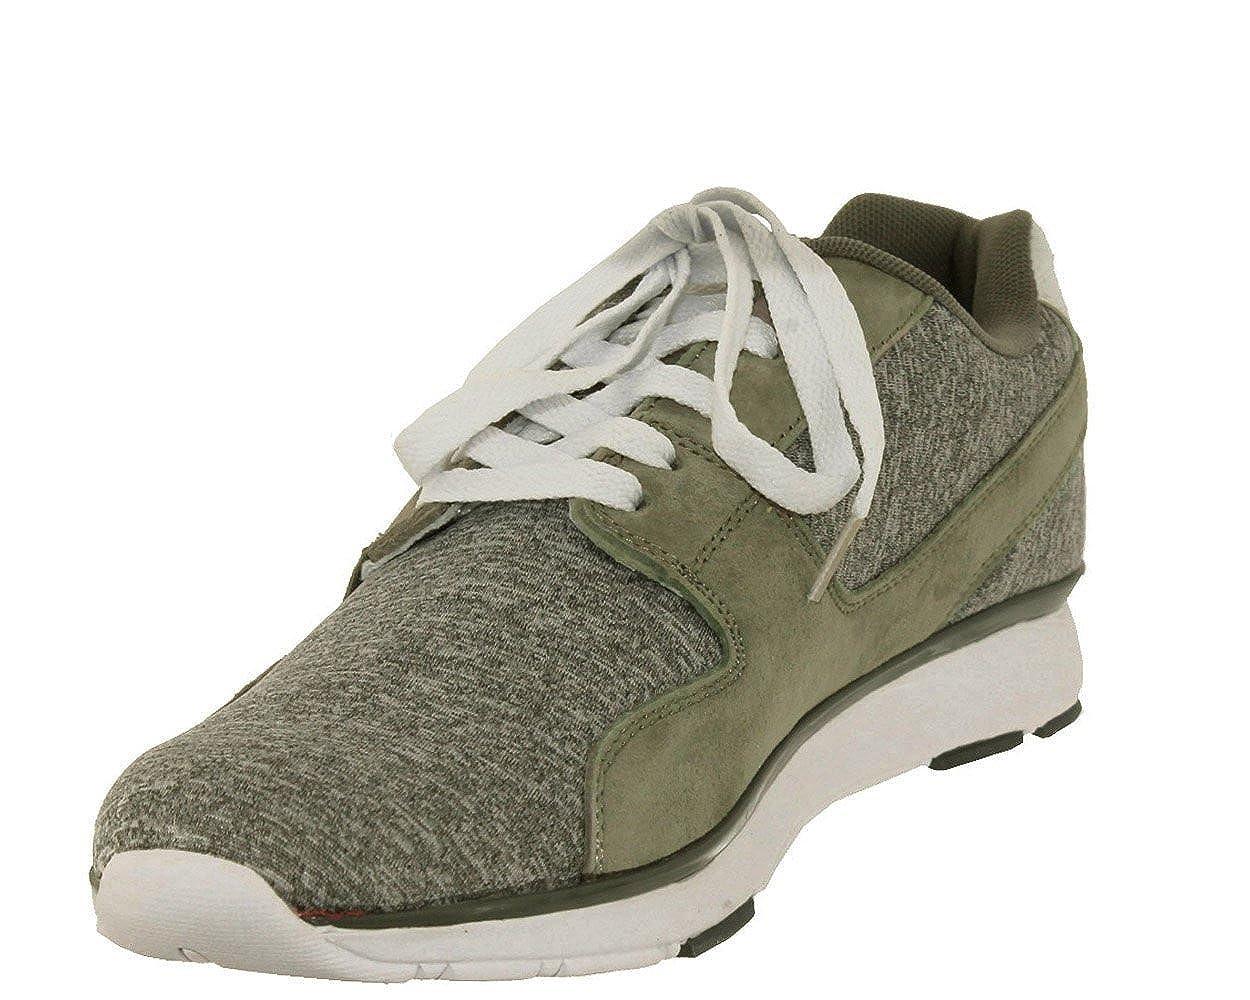 Redskins - Zapatos Zapatos Zapatos de Cordones Hombre 9fa926